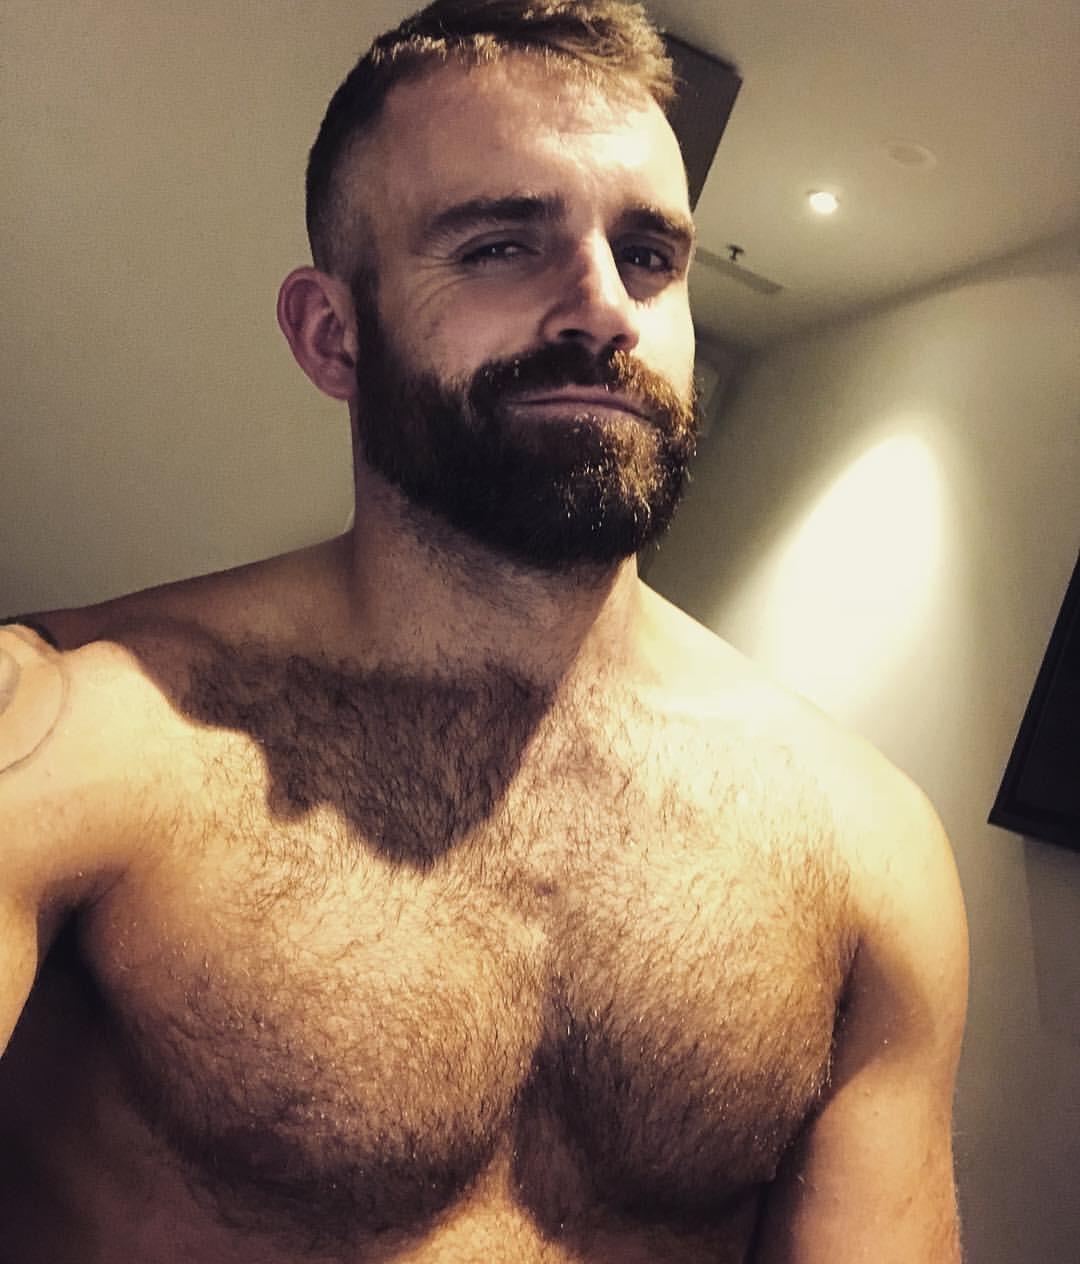 2019-01-02 12:23:42 - rgod09 instagram beardburnme http://www.neofic.com